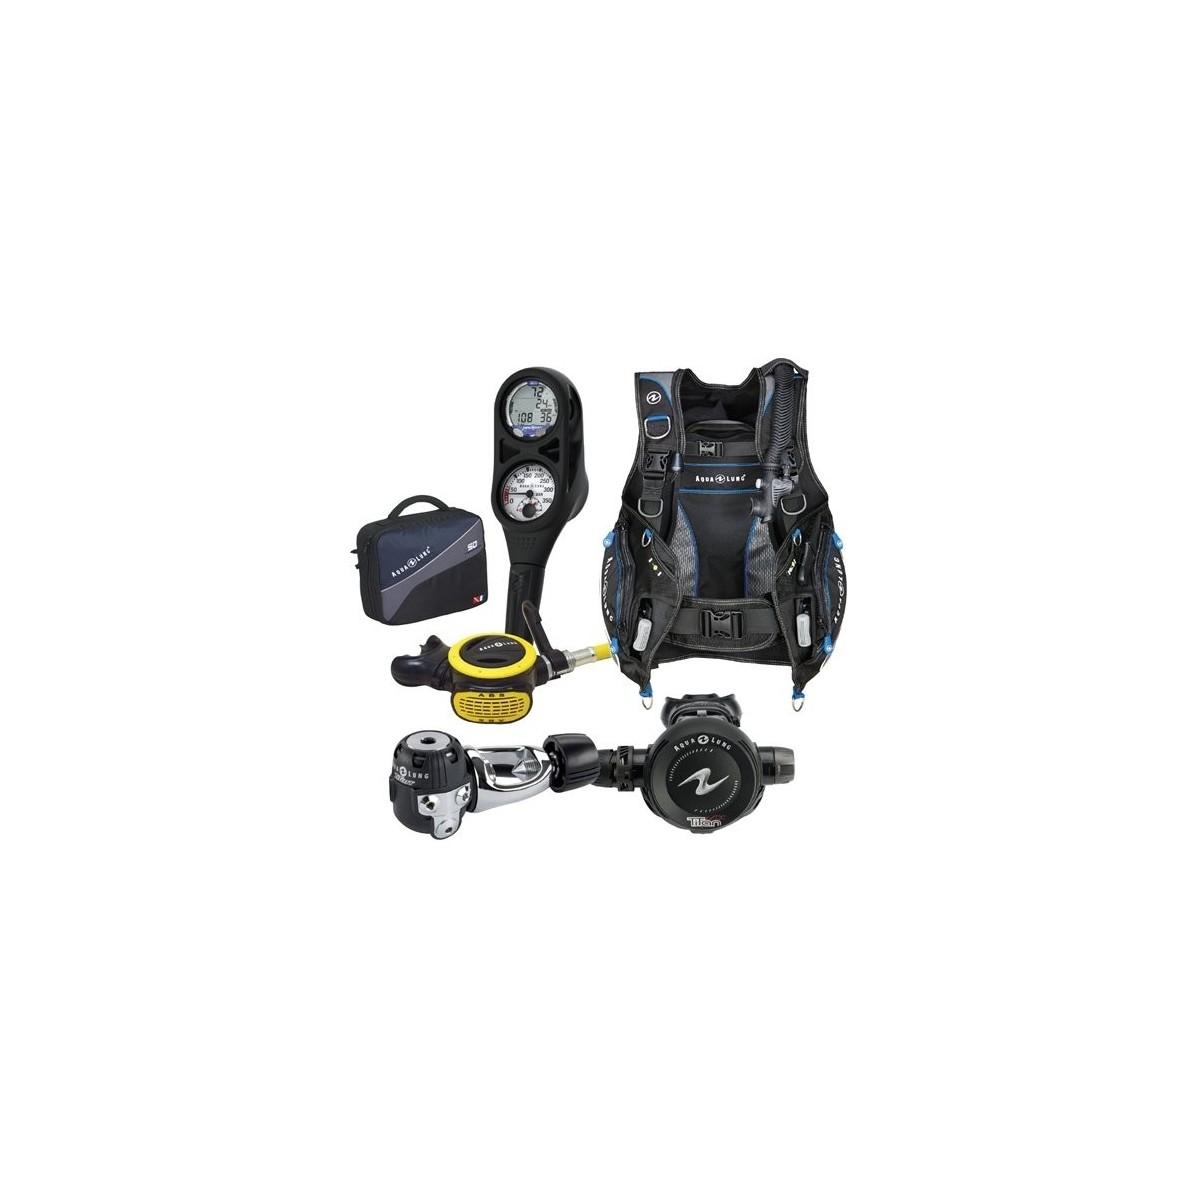 Aqua Lung Pro HD BCD, i300 2 Gauge Dive Computer, Titan / ABS Regulator Set with Regulator Bag Gear Package